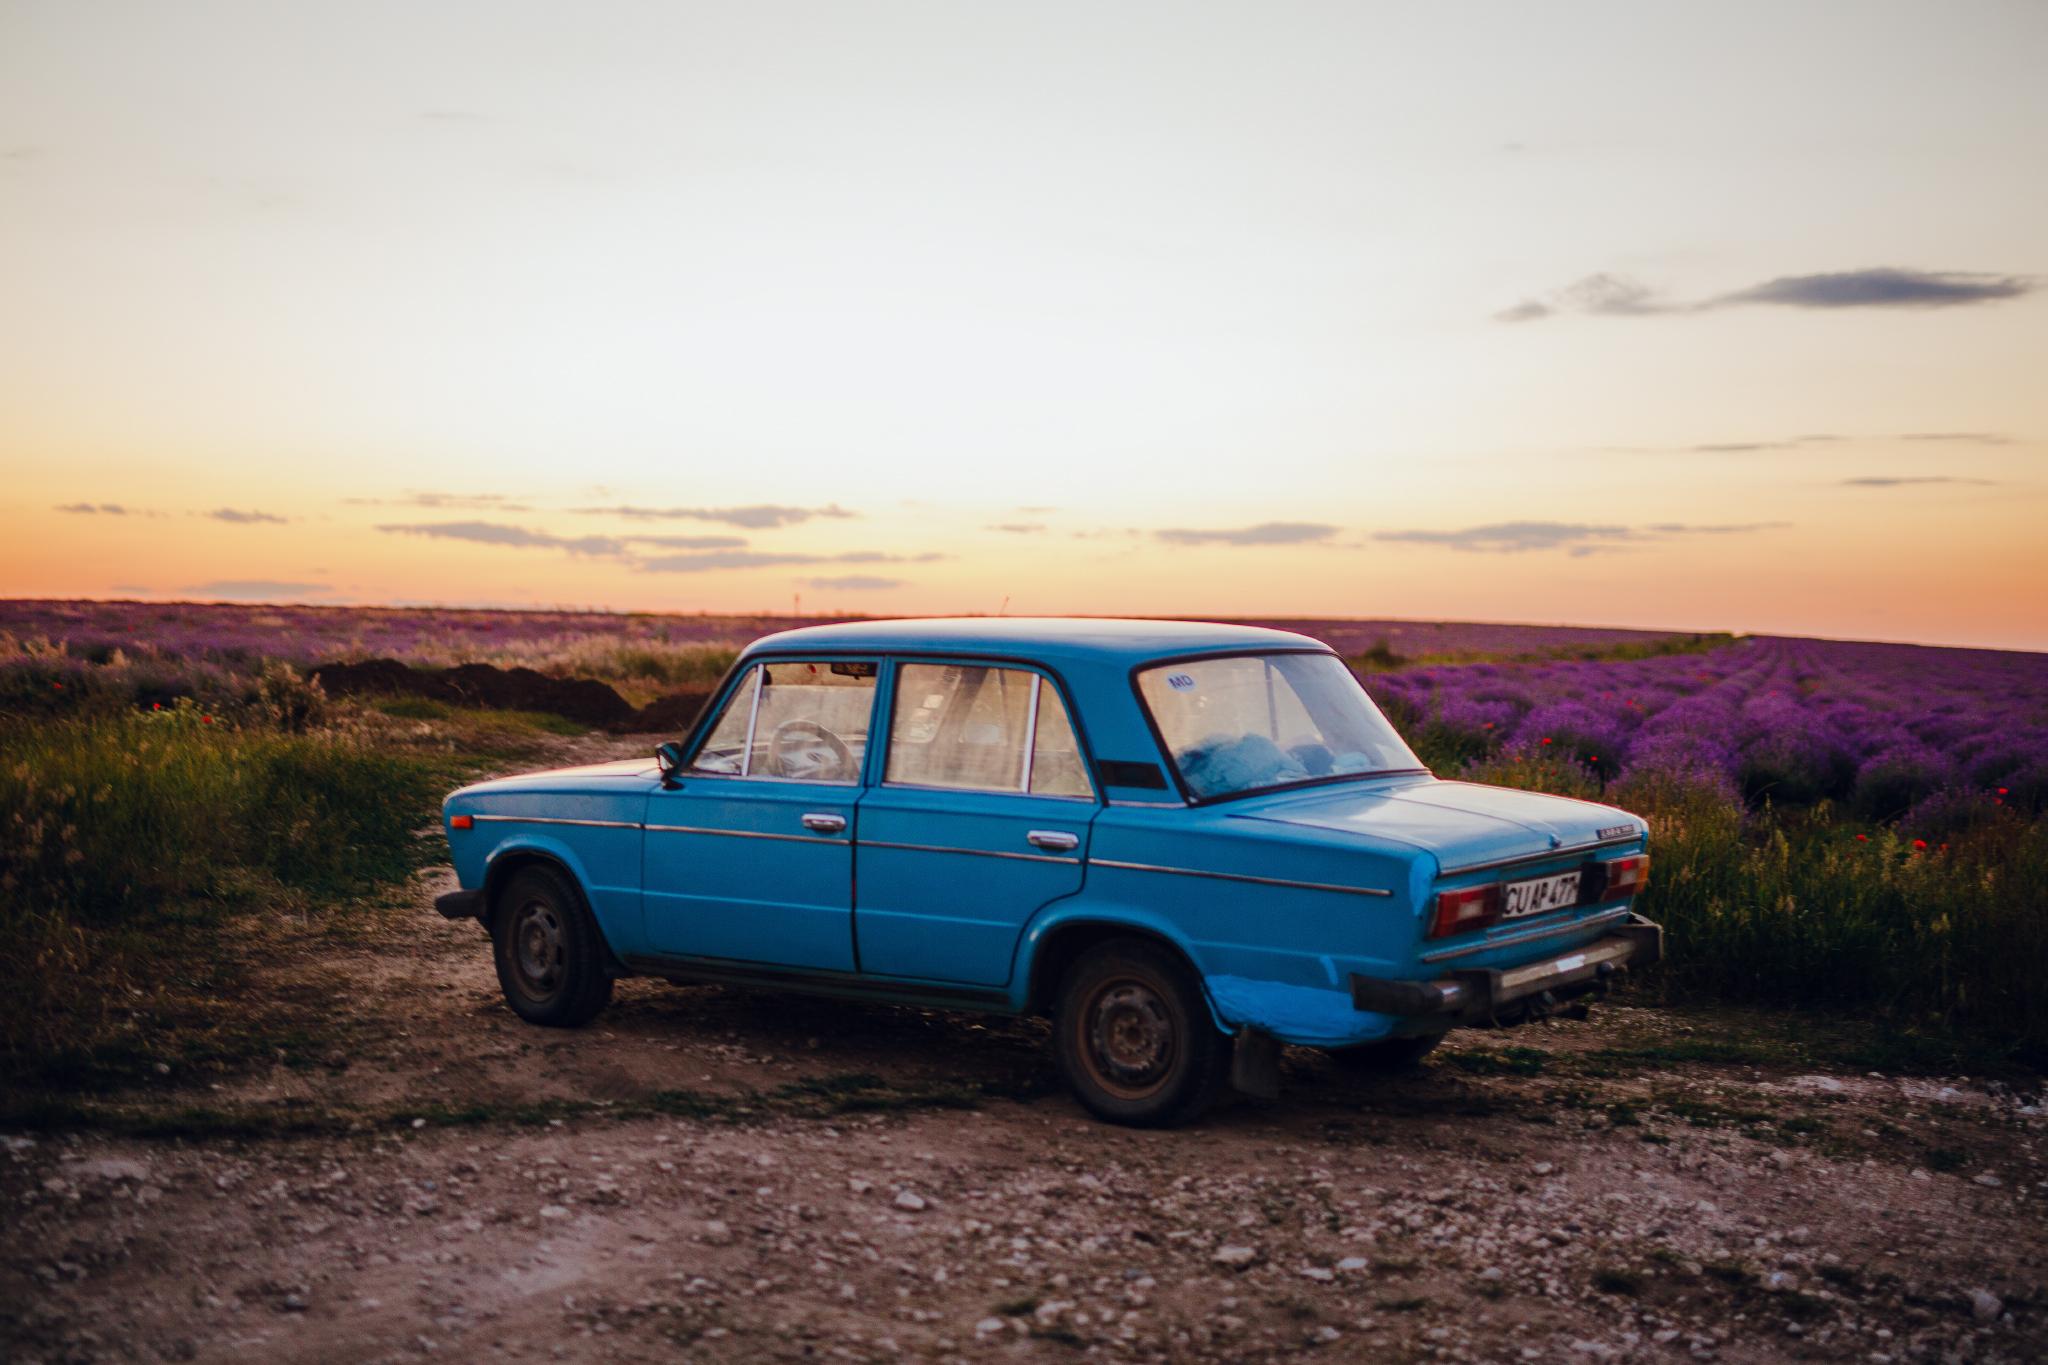 san diego wedding   photographer | blue car in lavender fields against blue-orange sky